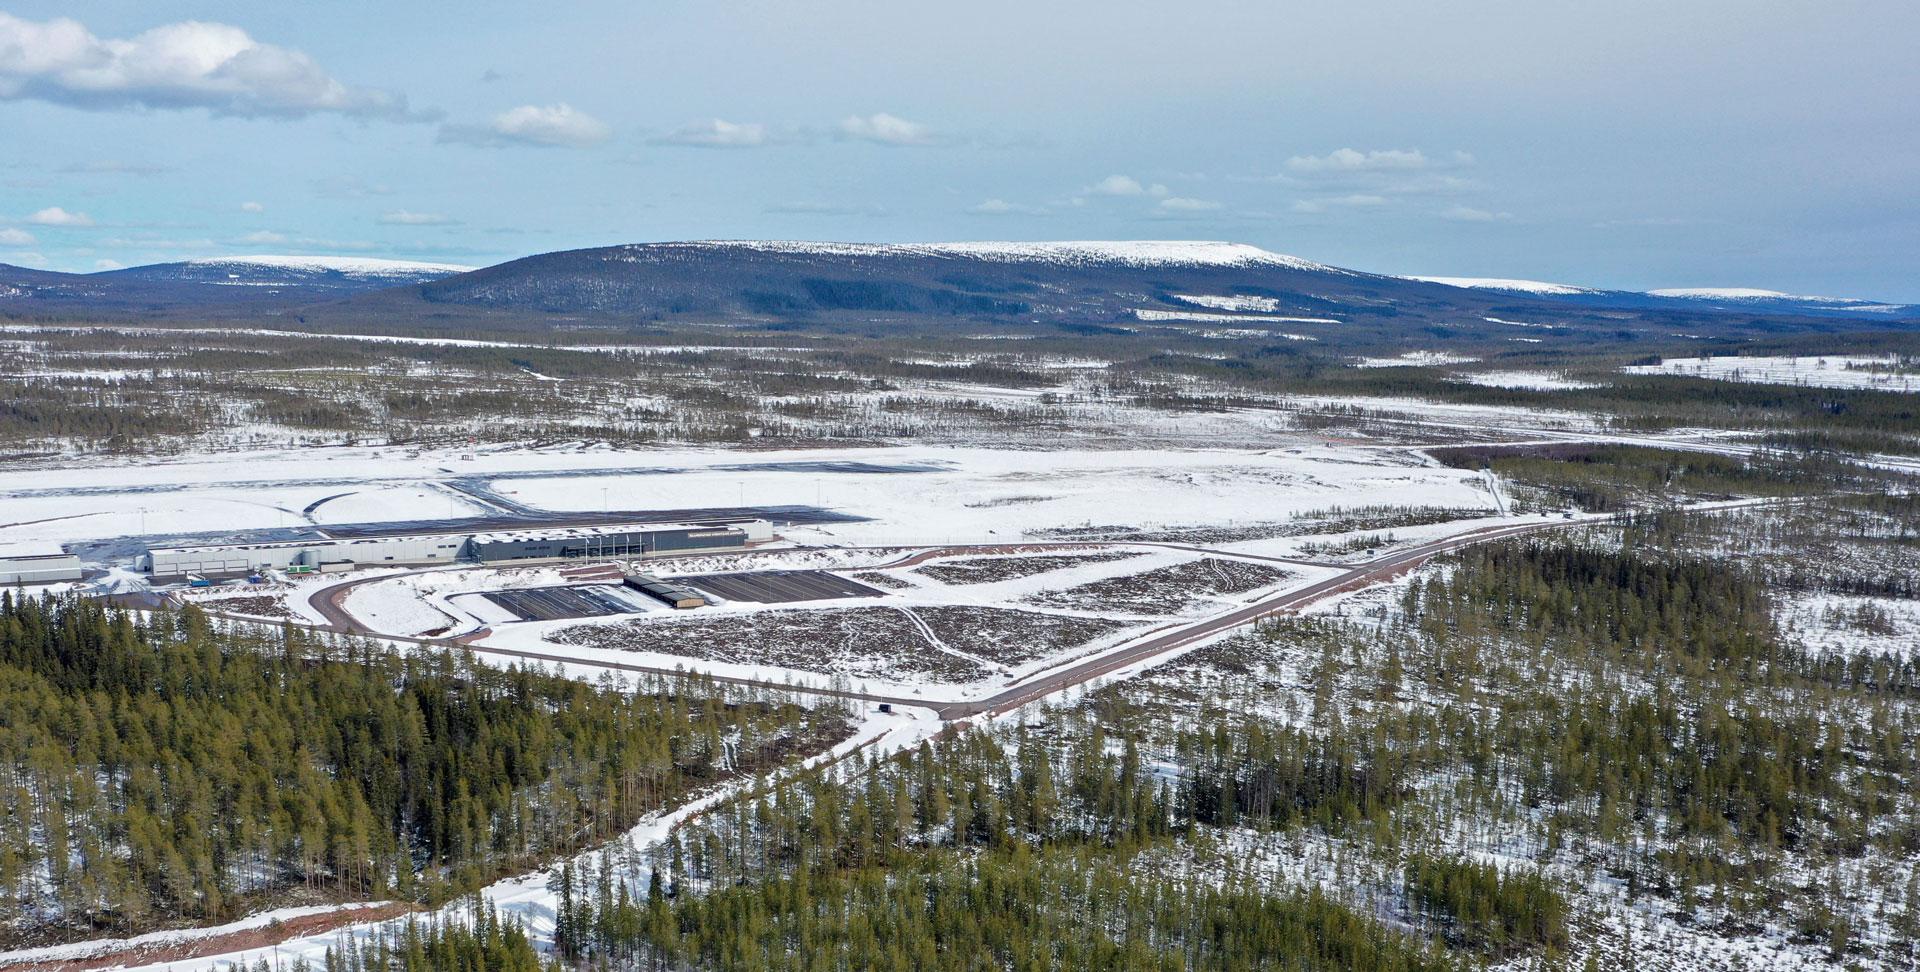 Vy Scandinavian Mountains Airport